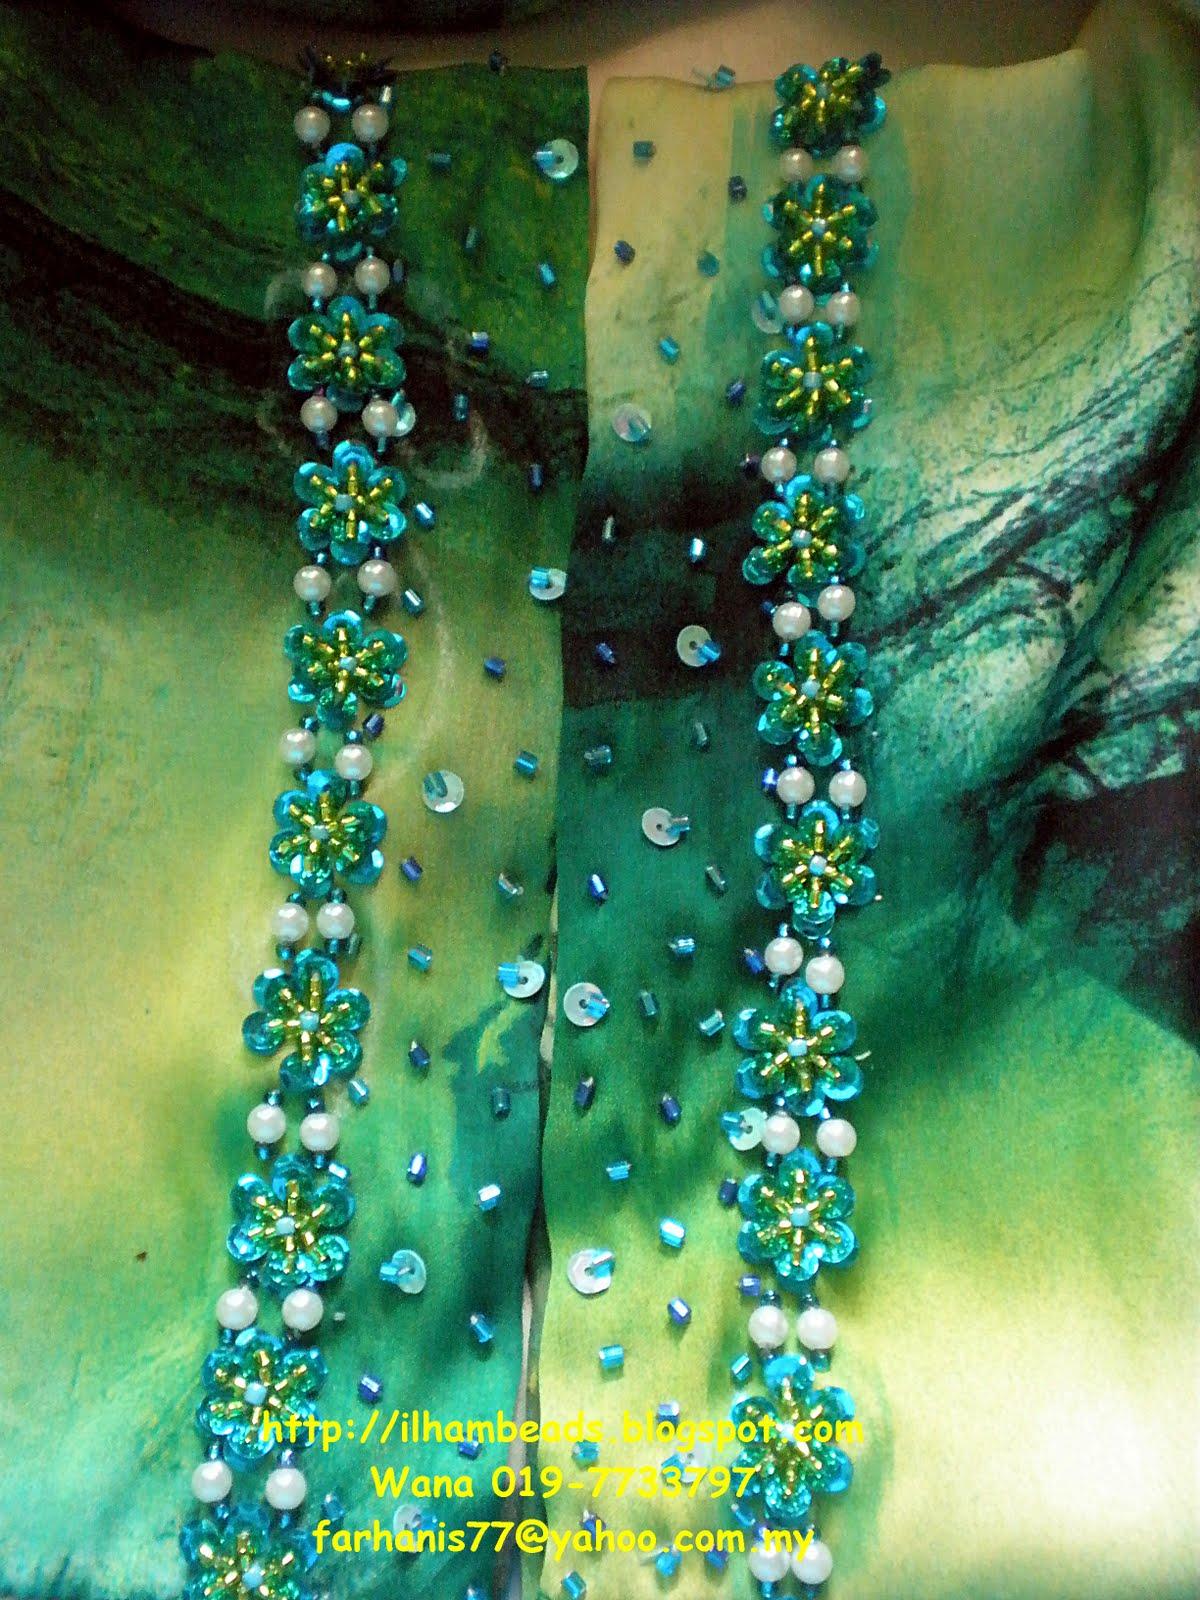 ilhambeads.blogspot.com/2010/07/jahitan-manik-2010-ilusi-3d.html